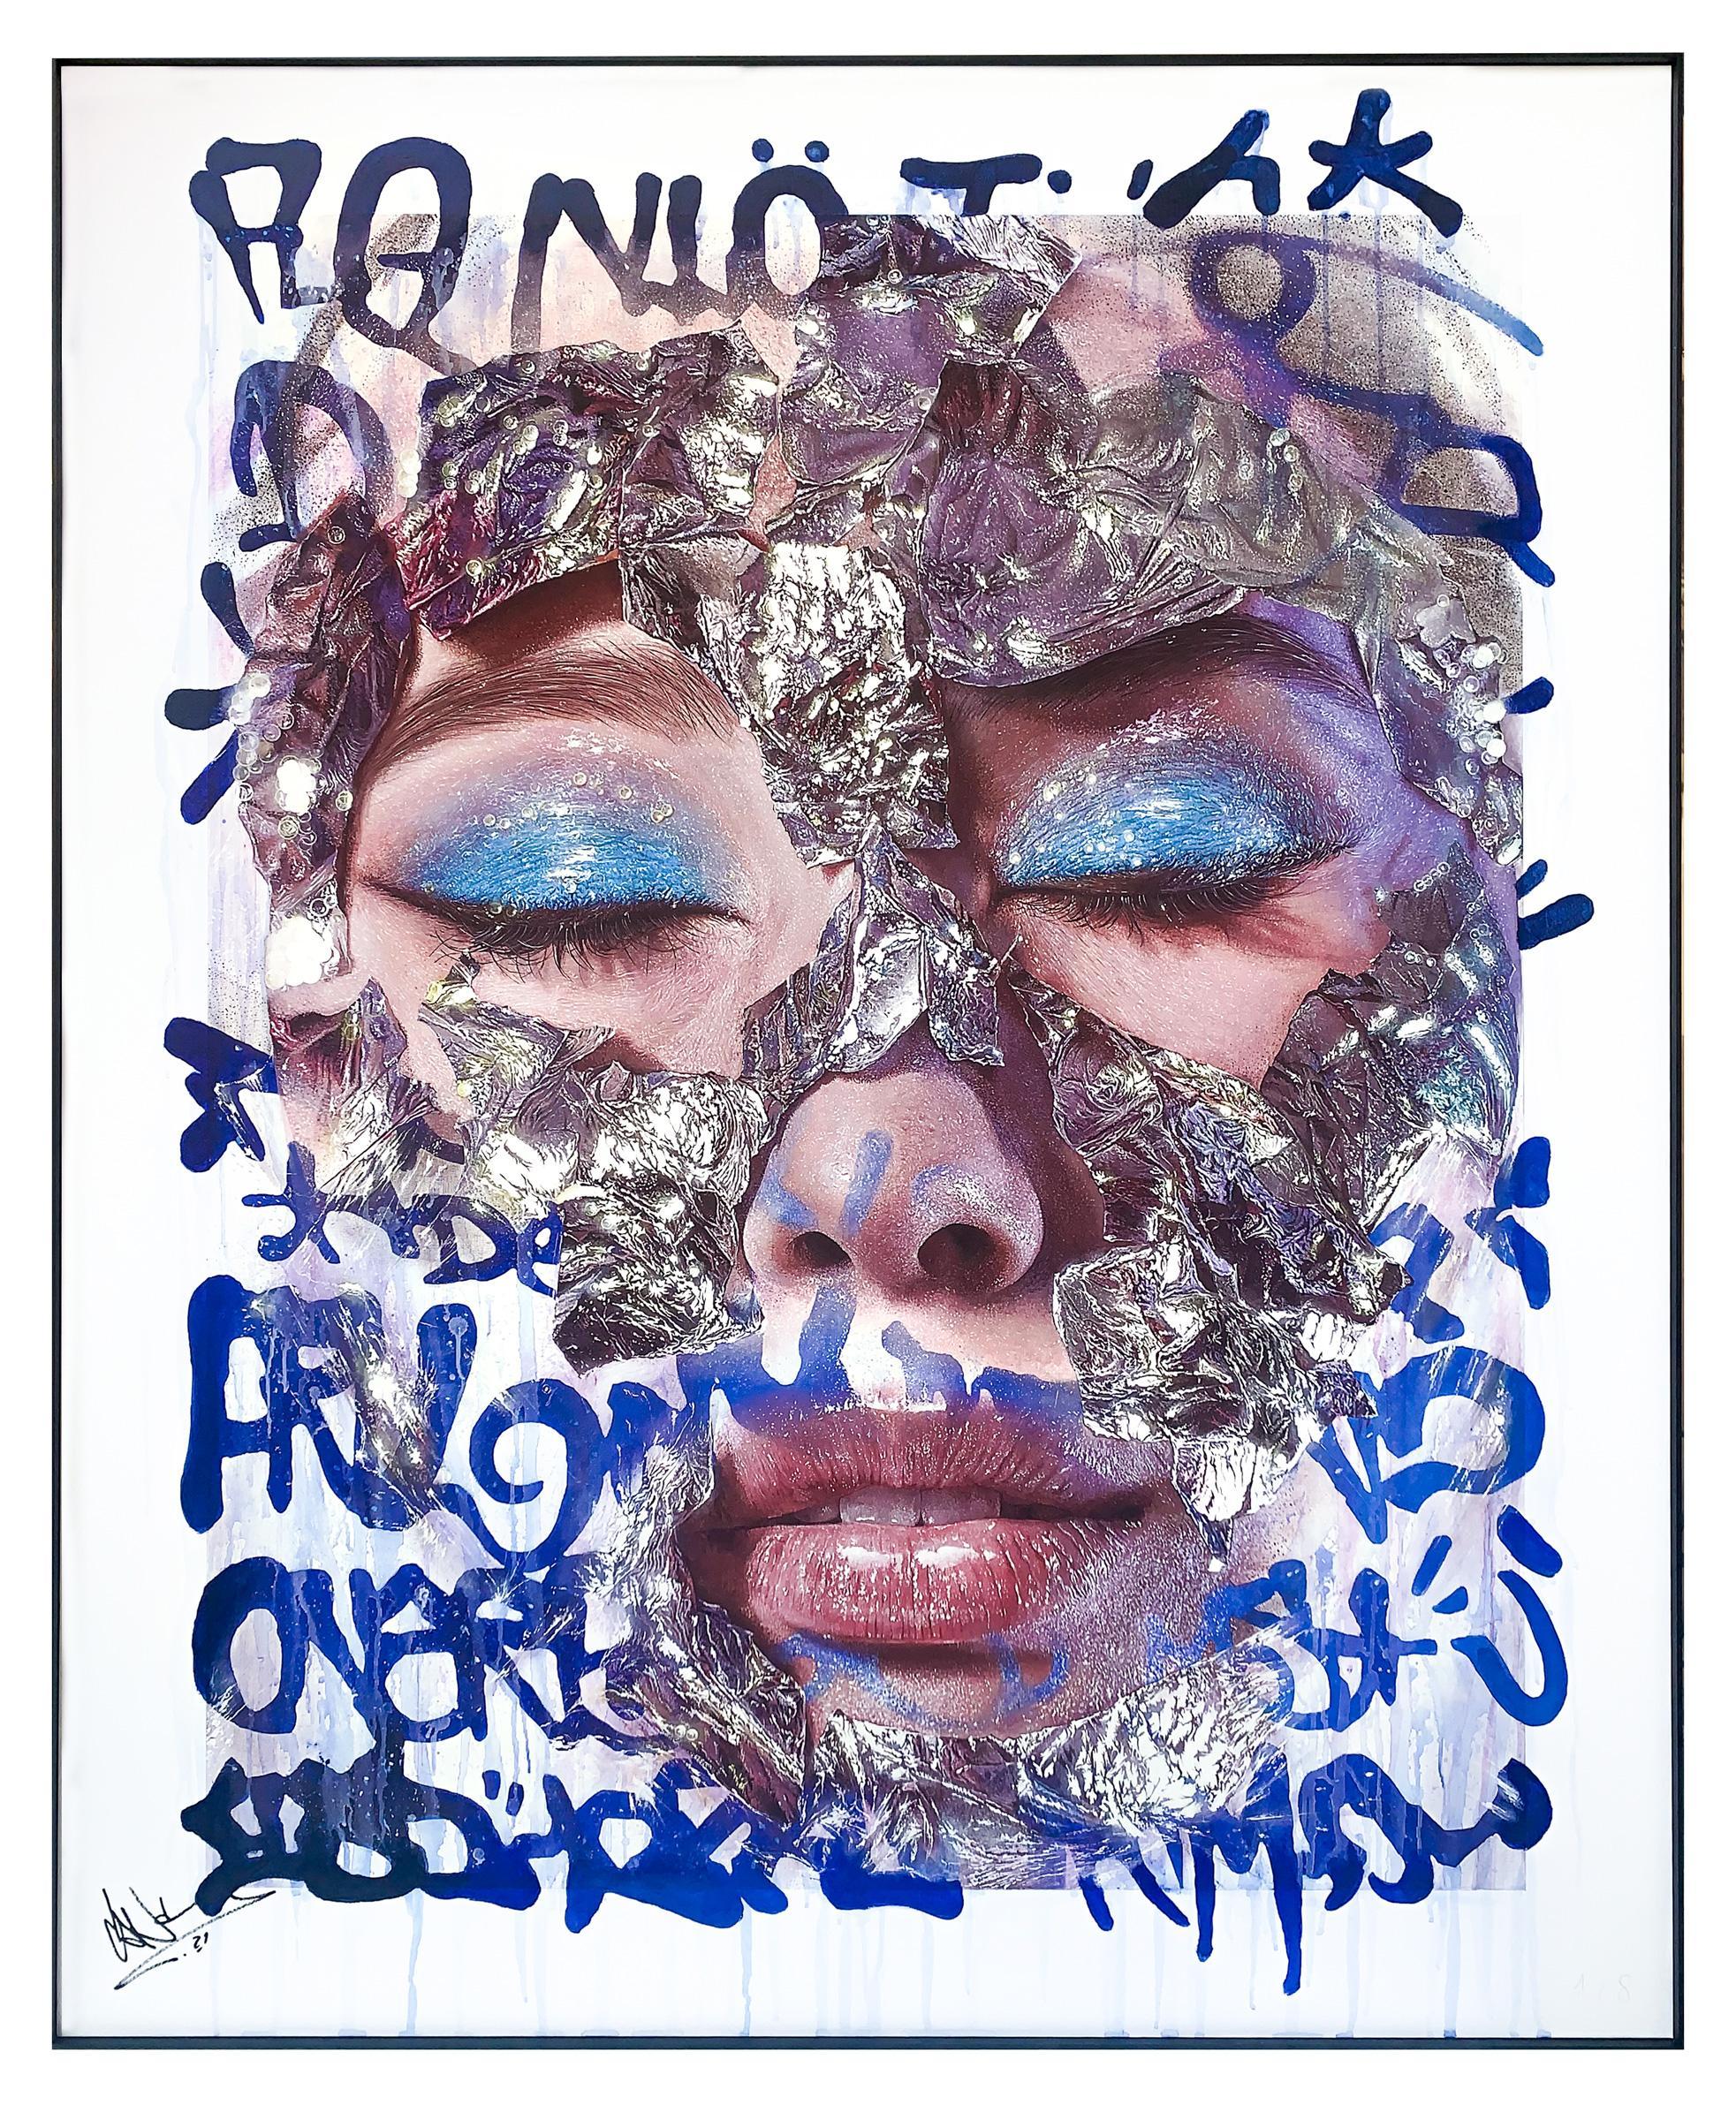 Duana (Ed) - 21st Century, Contemporary Urban Art, Pigment Print, Fine Art Paper